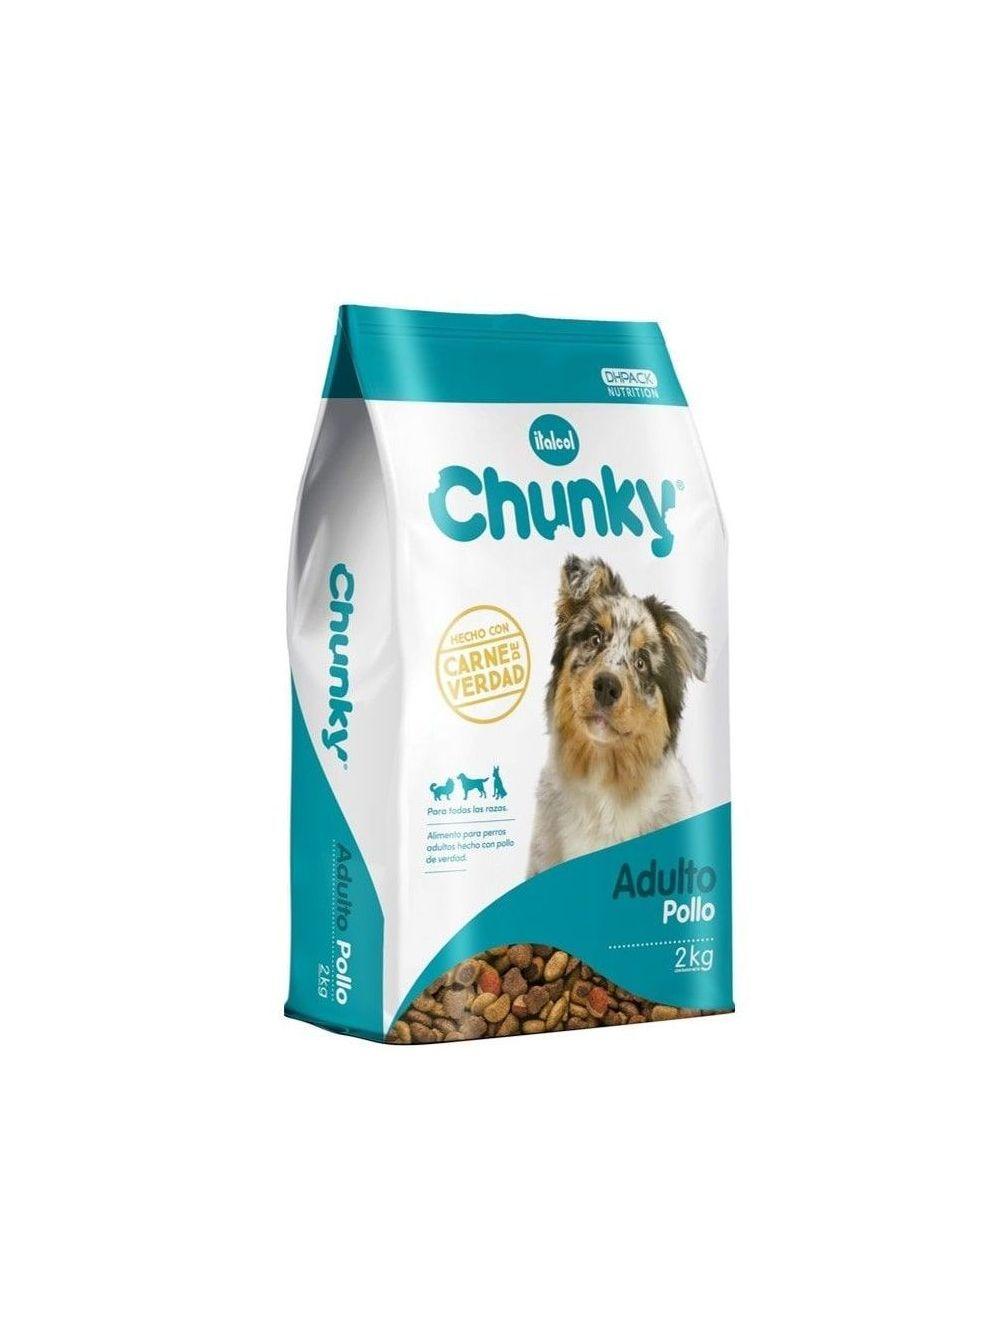 Comida para perro Chunky Adultos Pollo-Ciudaddemascotas.com